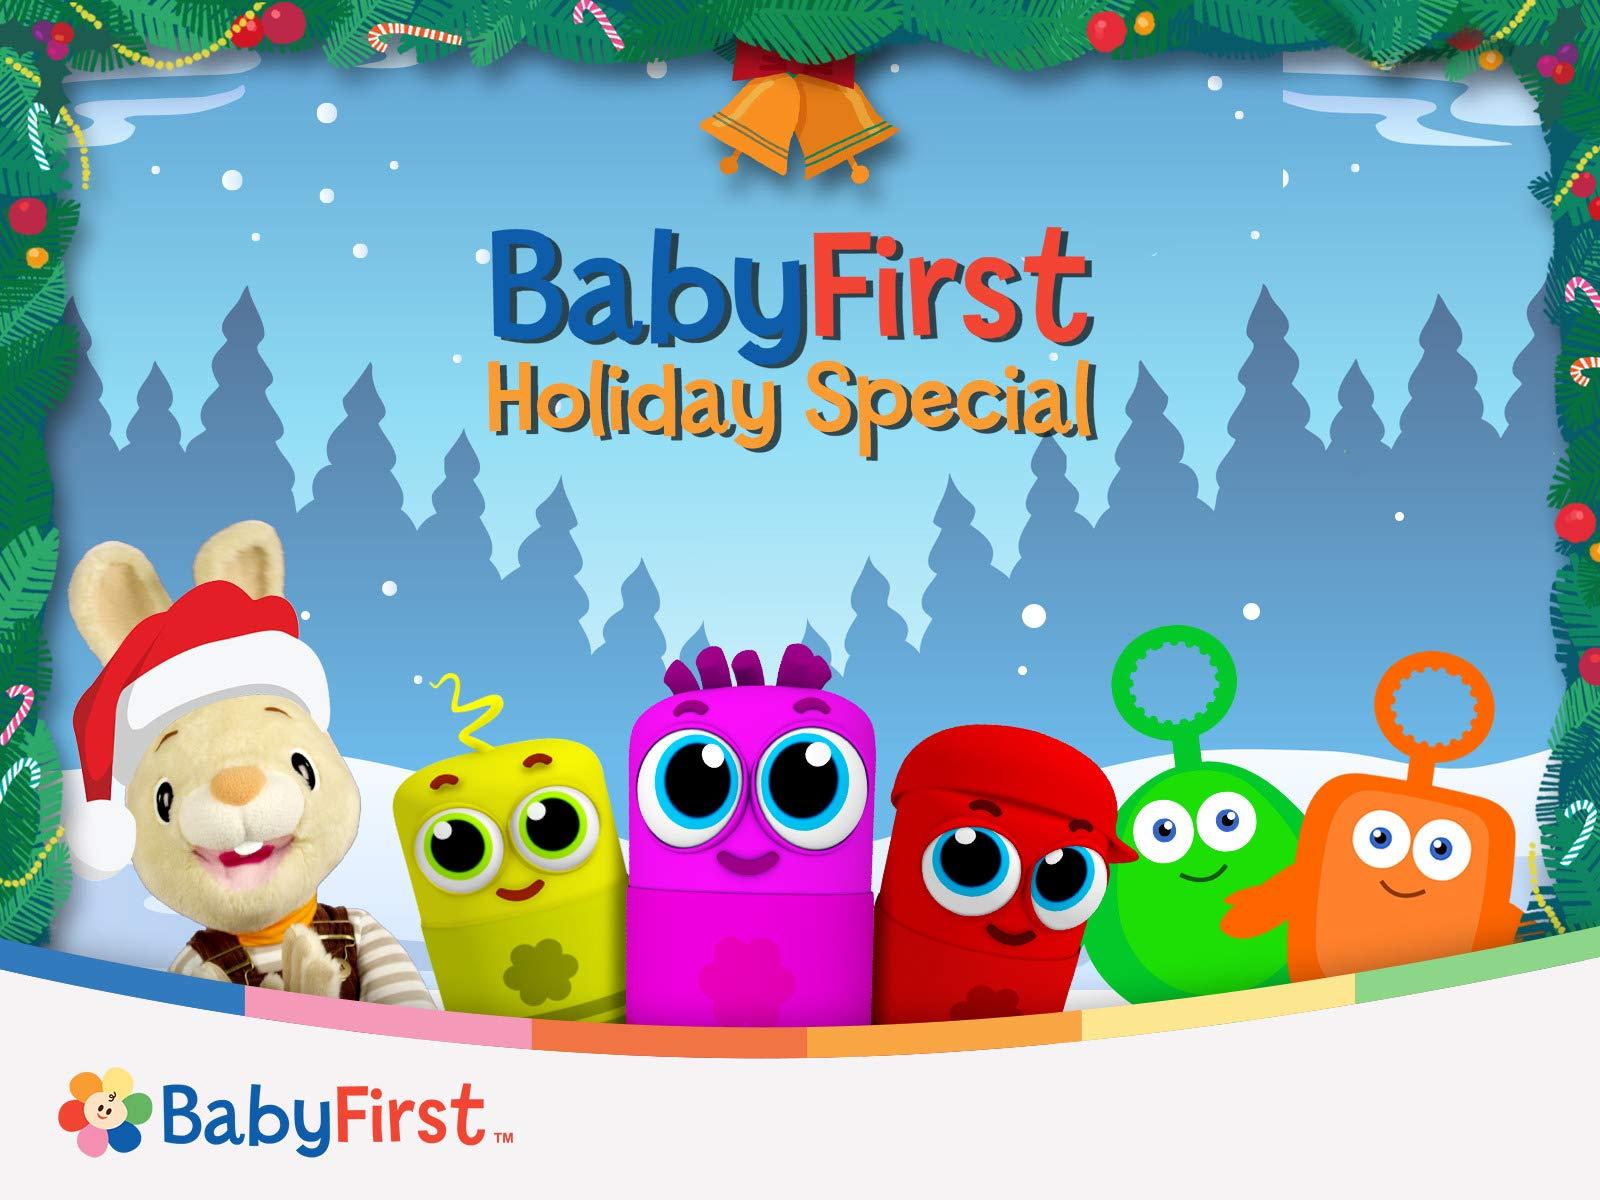 BabyFirst HolidaysSpecial - Season 2